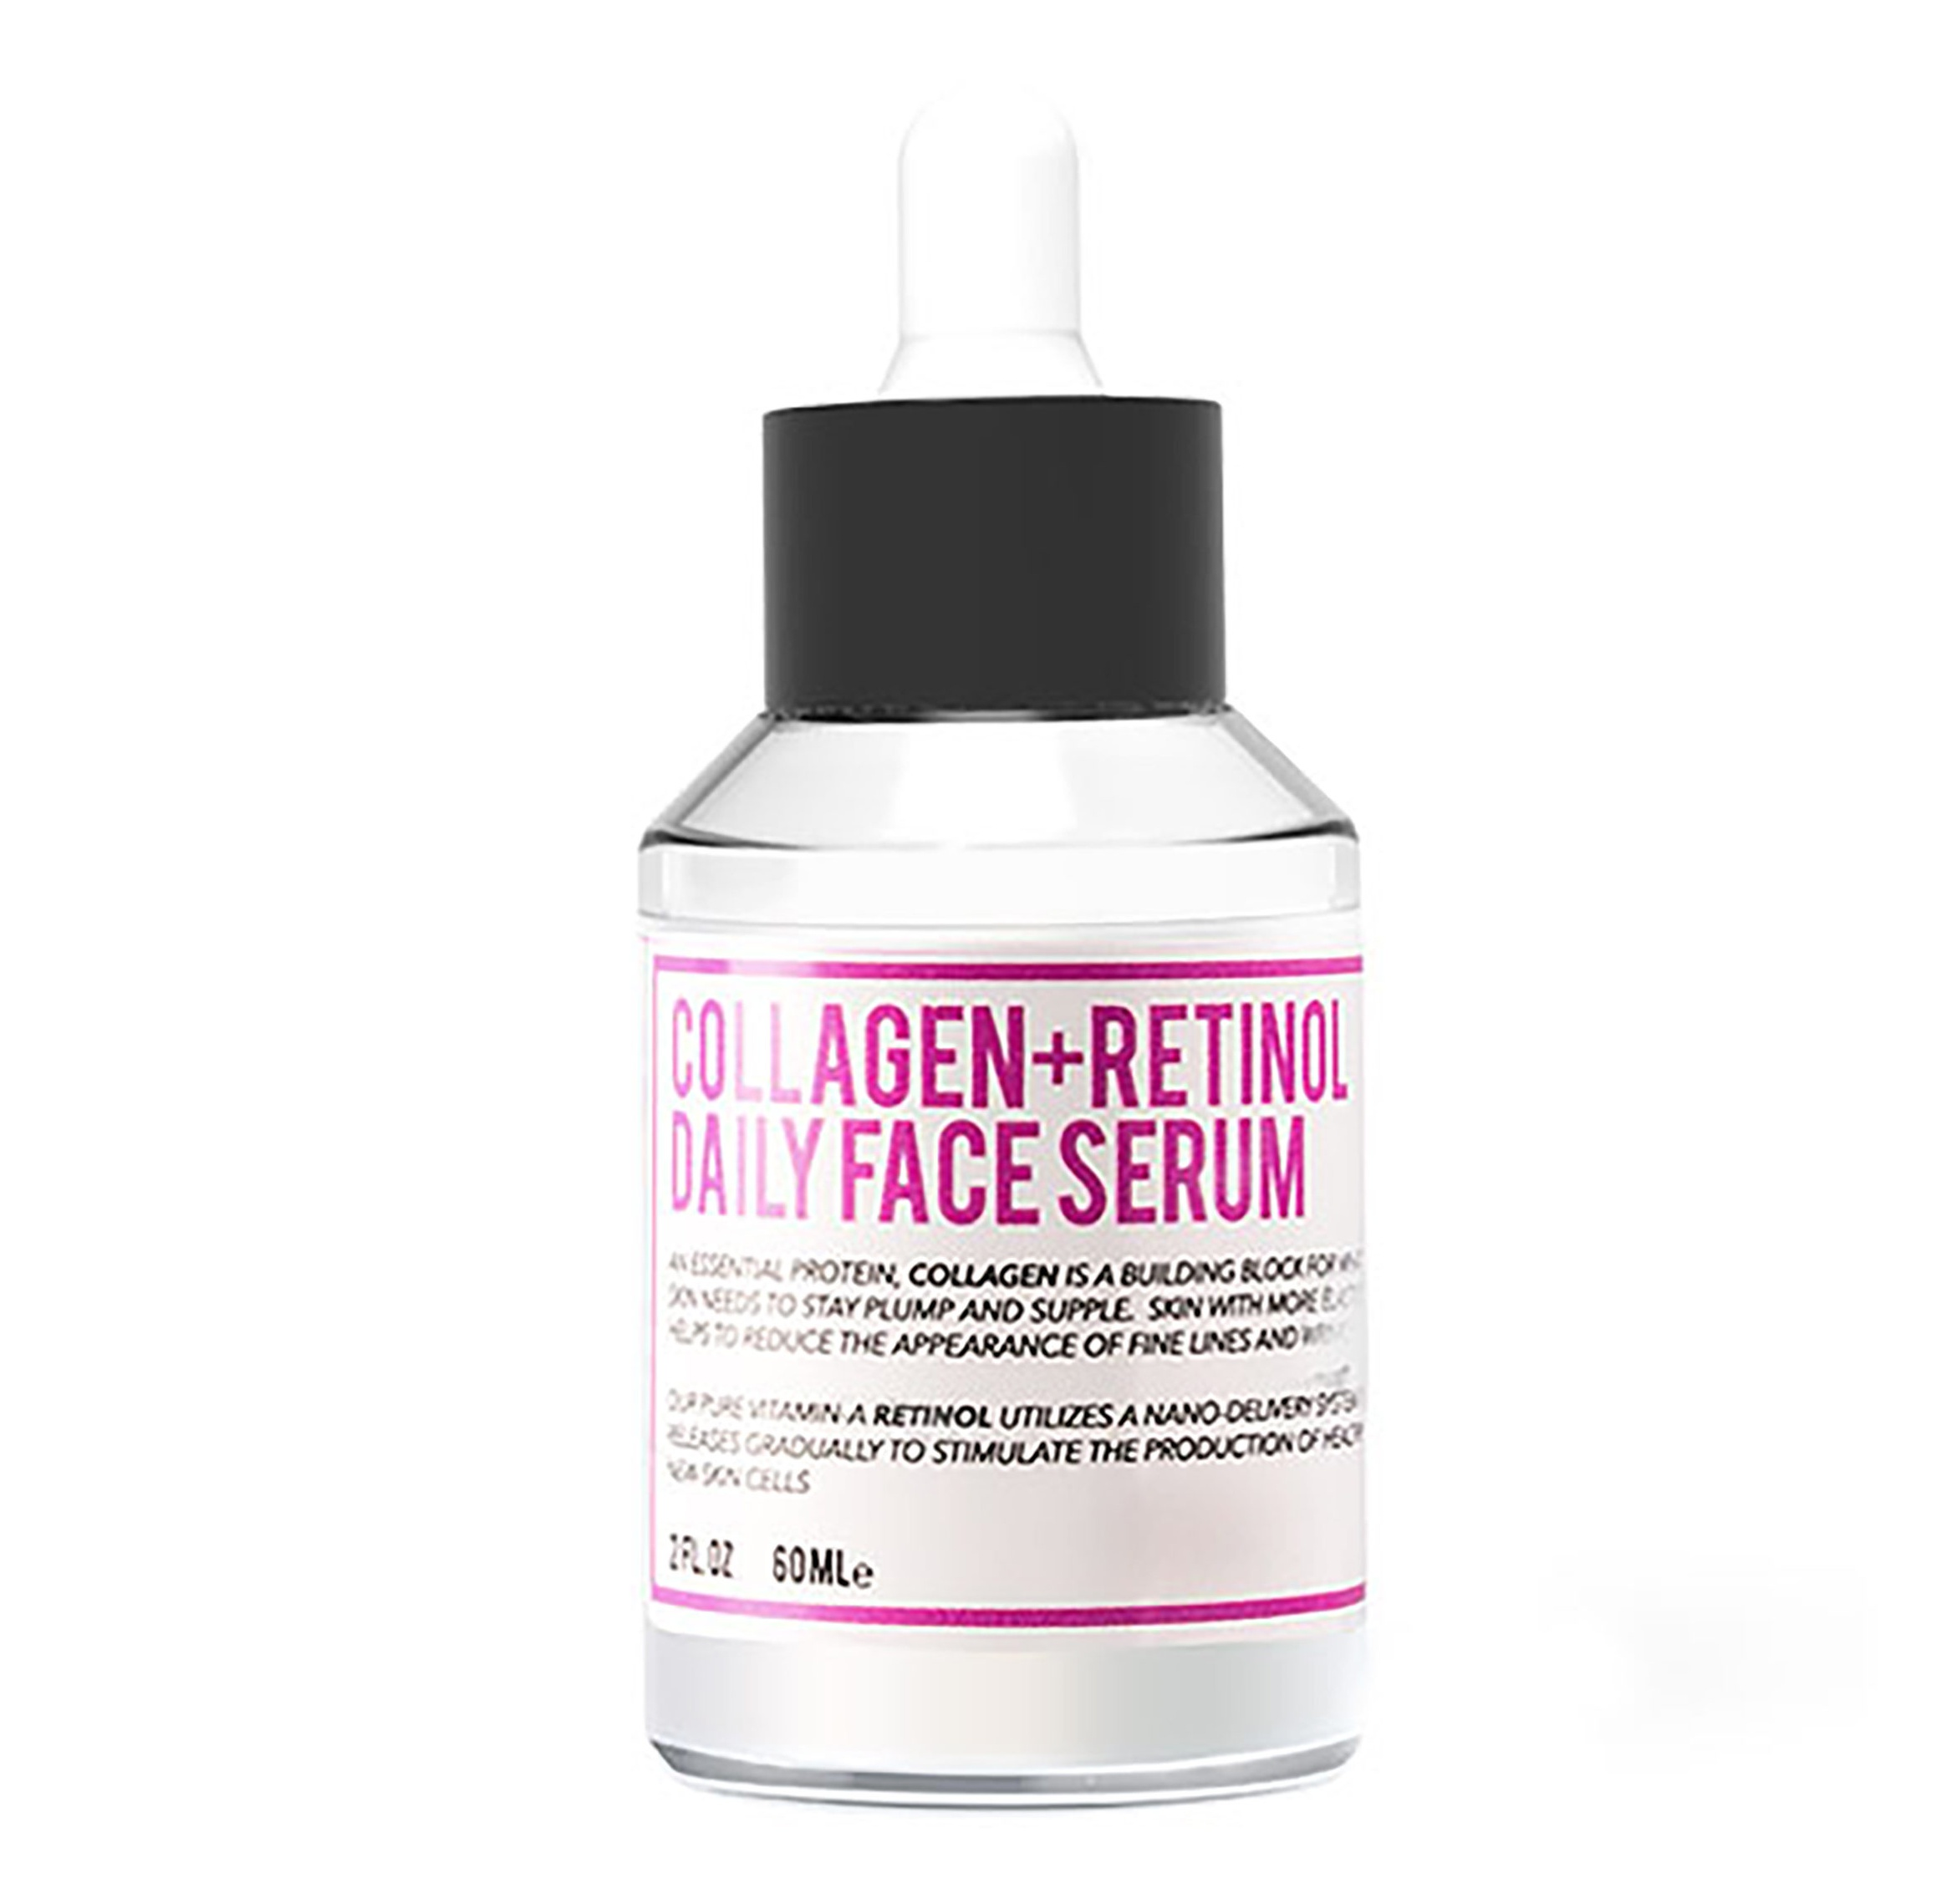 radience labs Collagen + Retinol Daily Face Serum